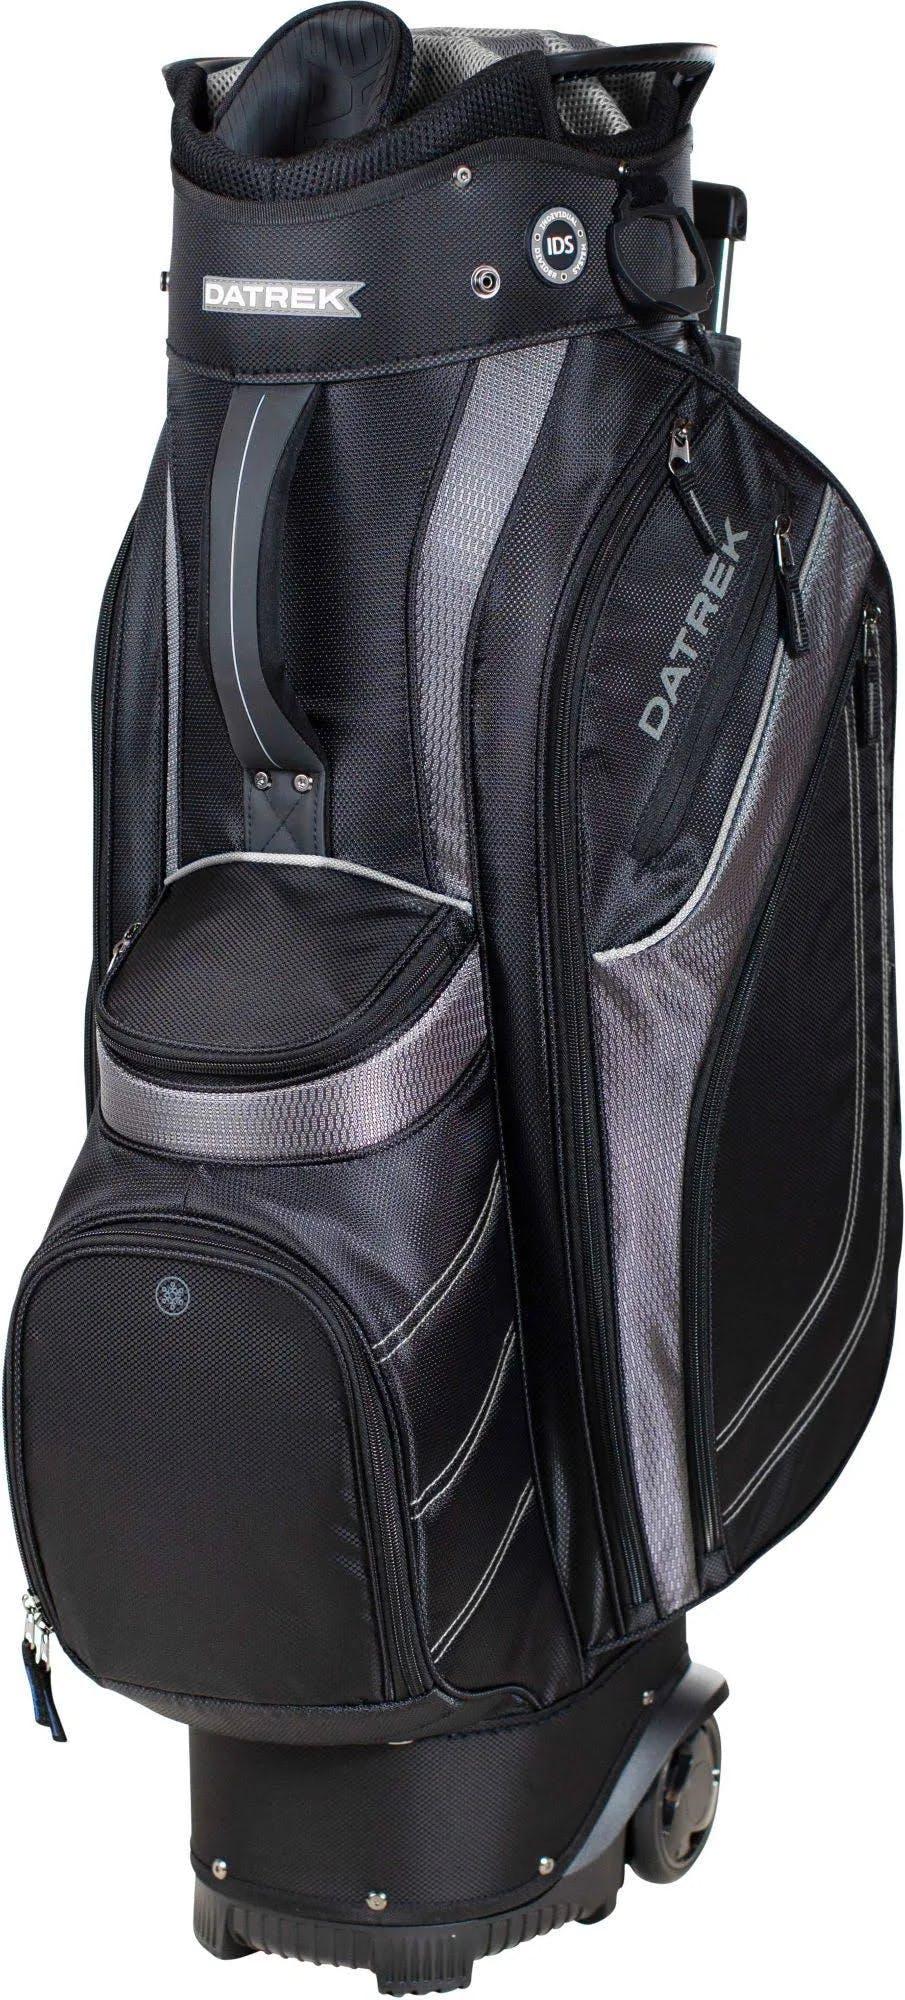 Datrek Transit Golf Cart Bag Black/Charcoal